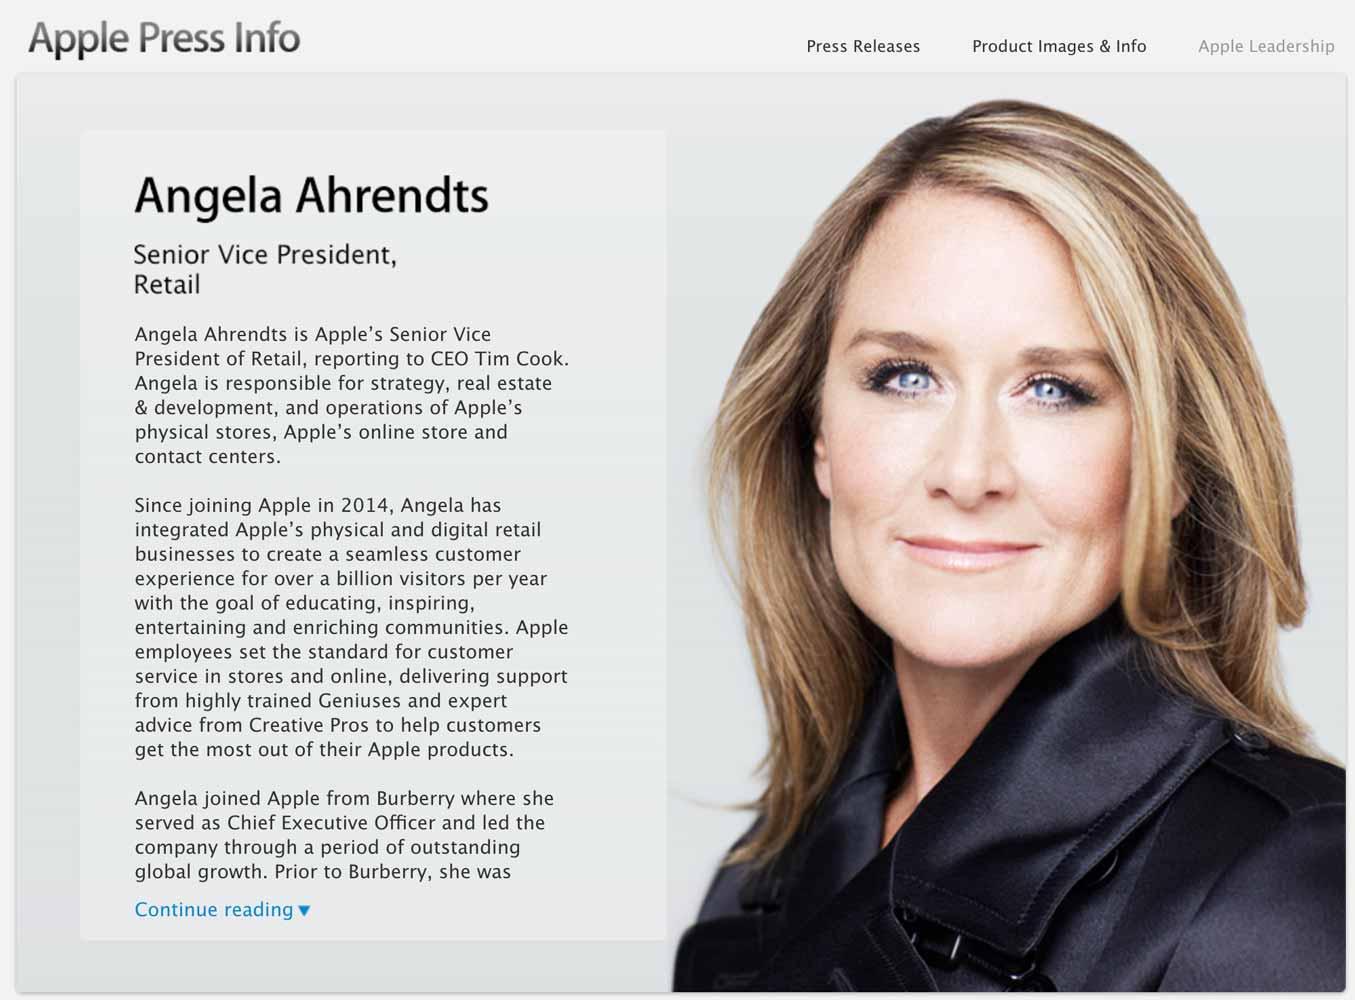 Apple、シニアヴァイスプレジデントAngela Ahrendts氏の肩書きから「Online Stores」の表記を削除